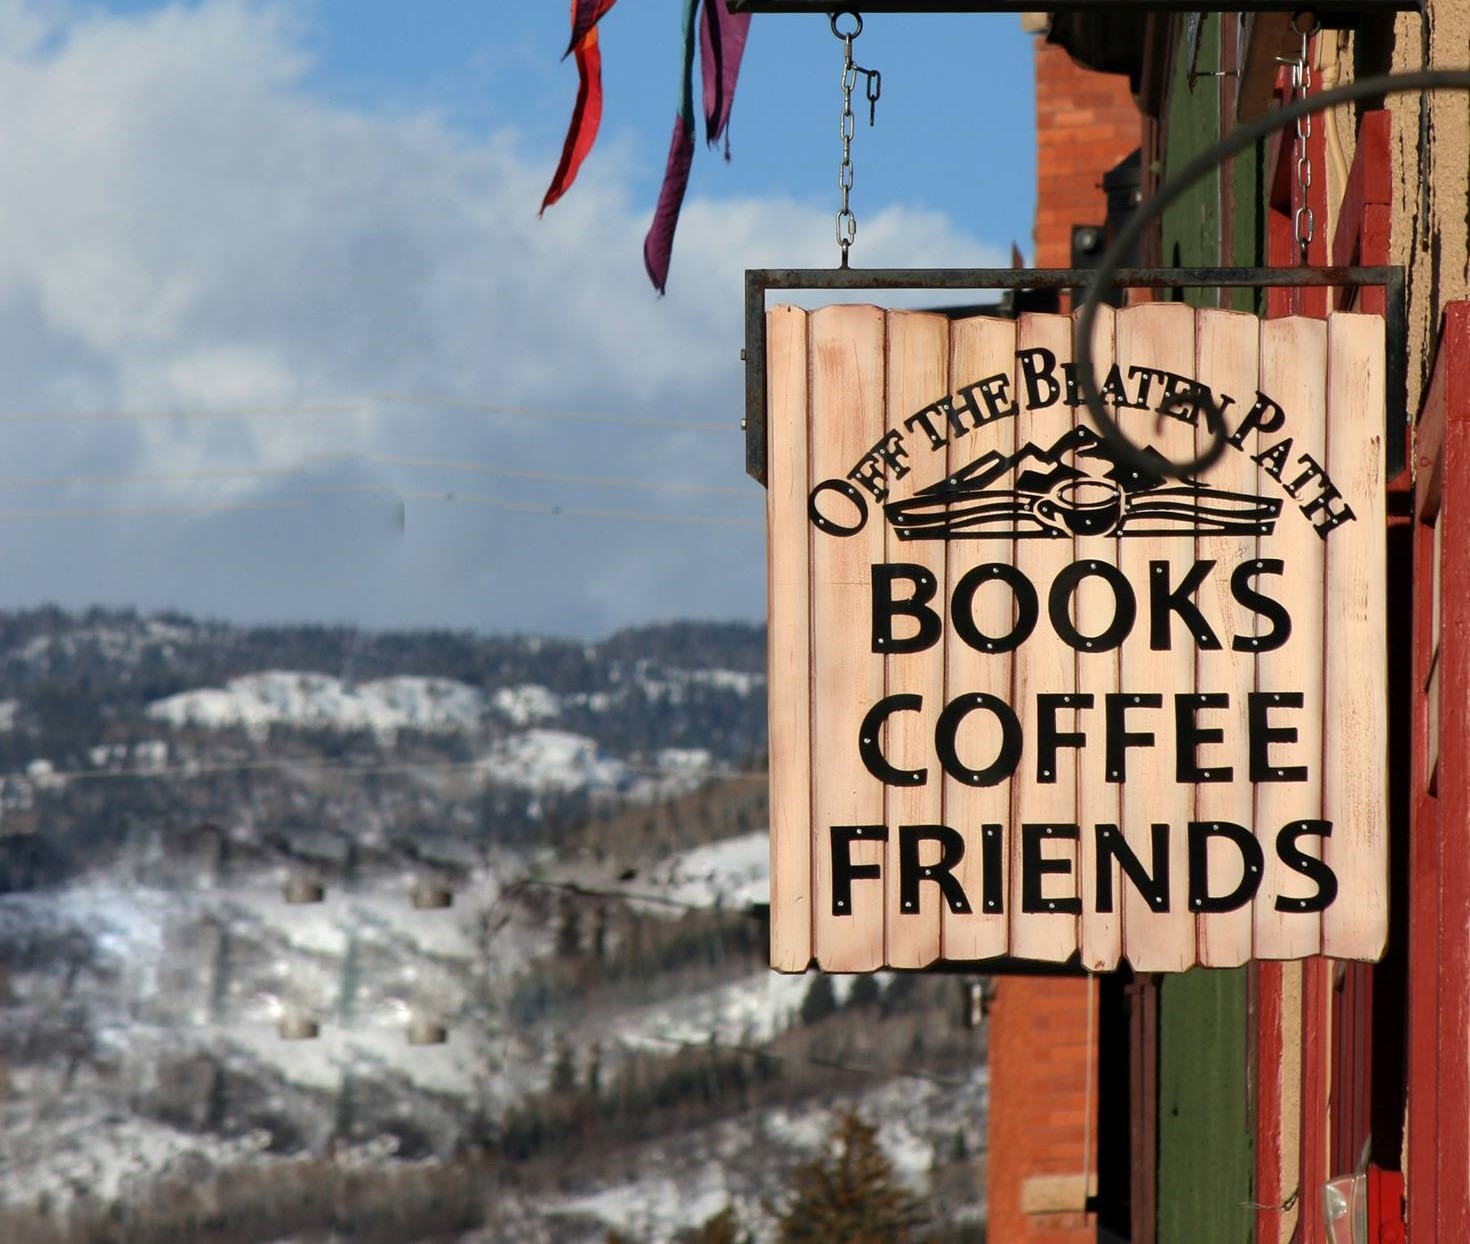 steamboat bookstore